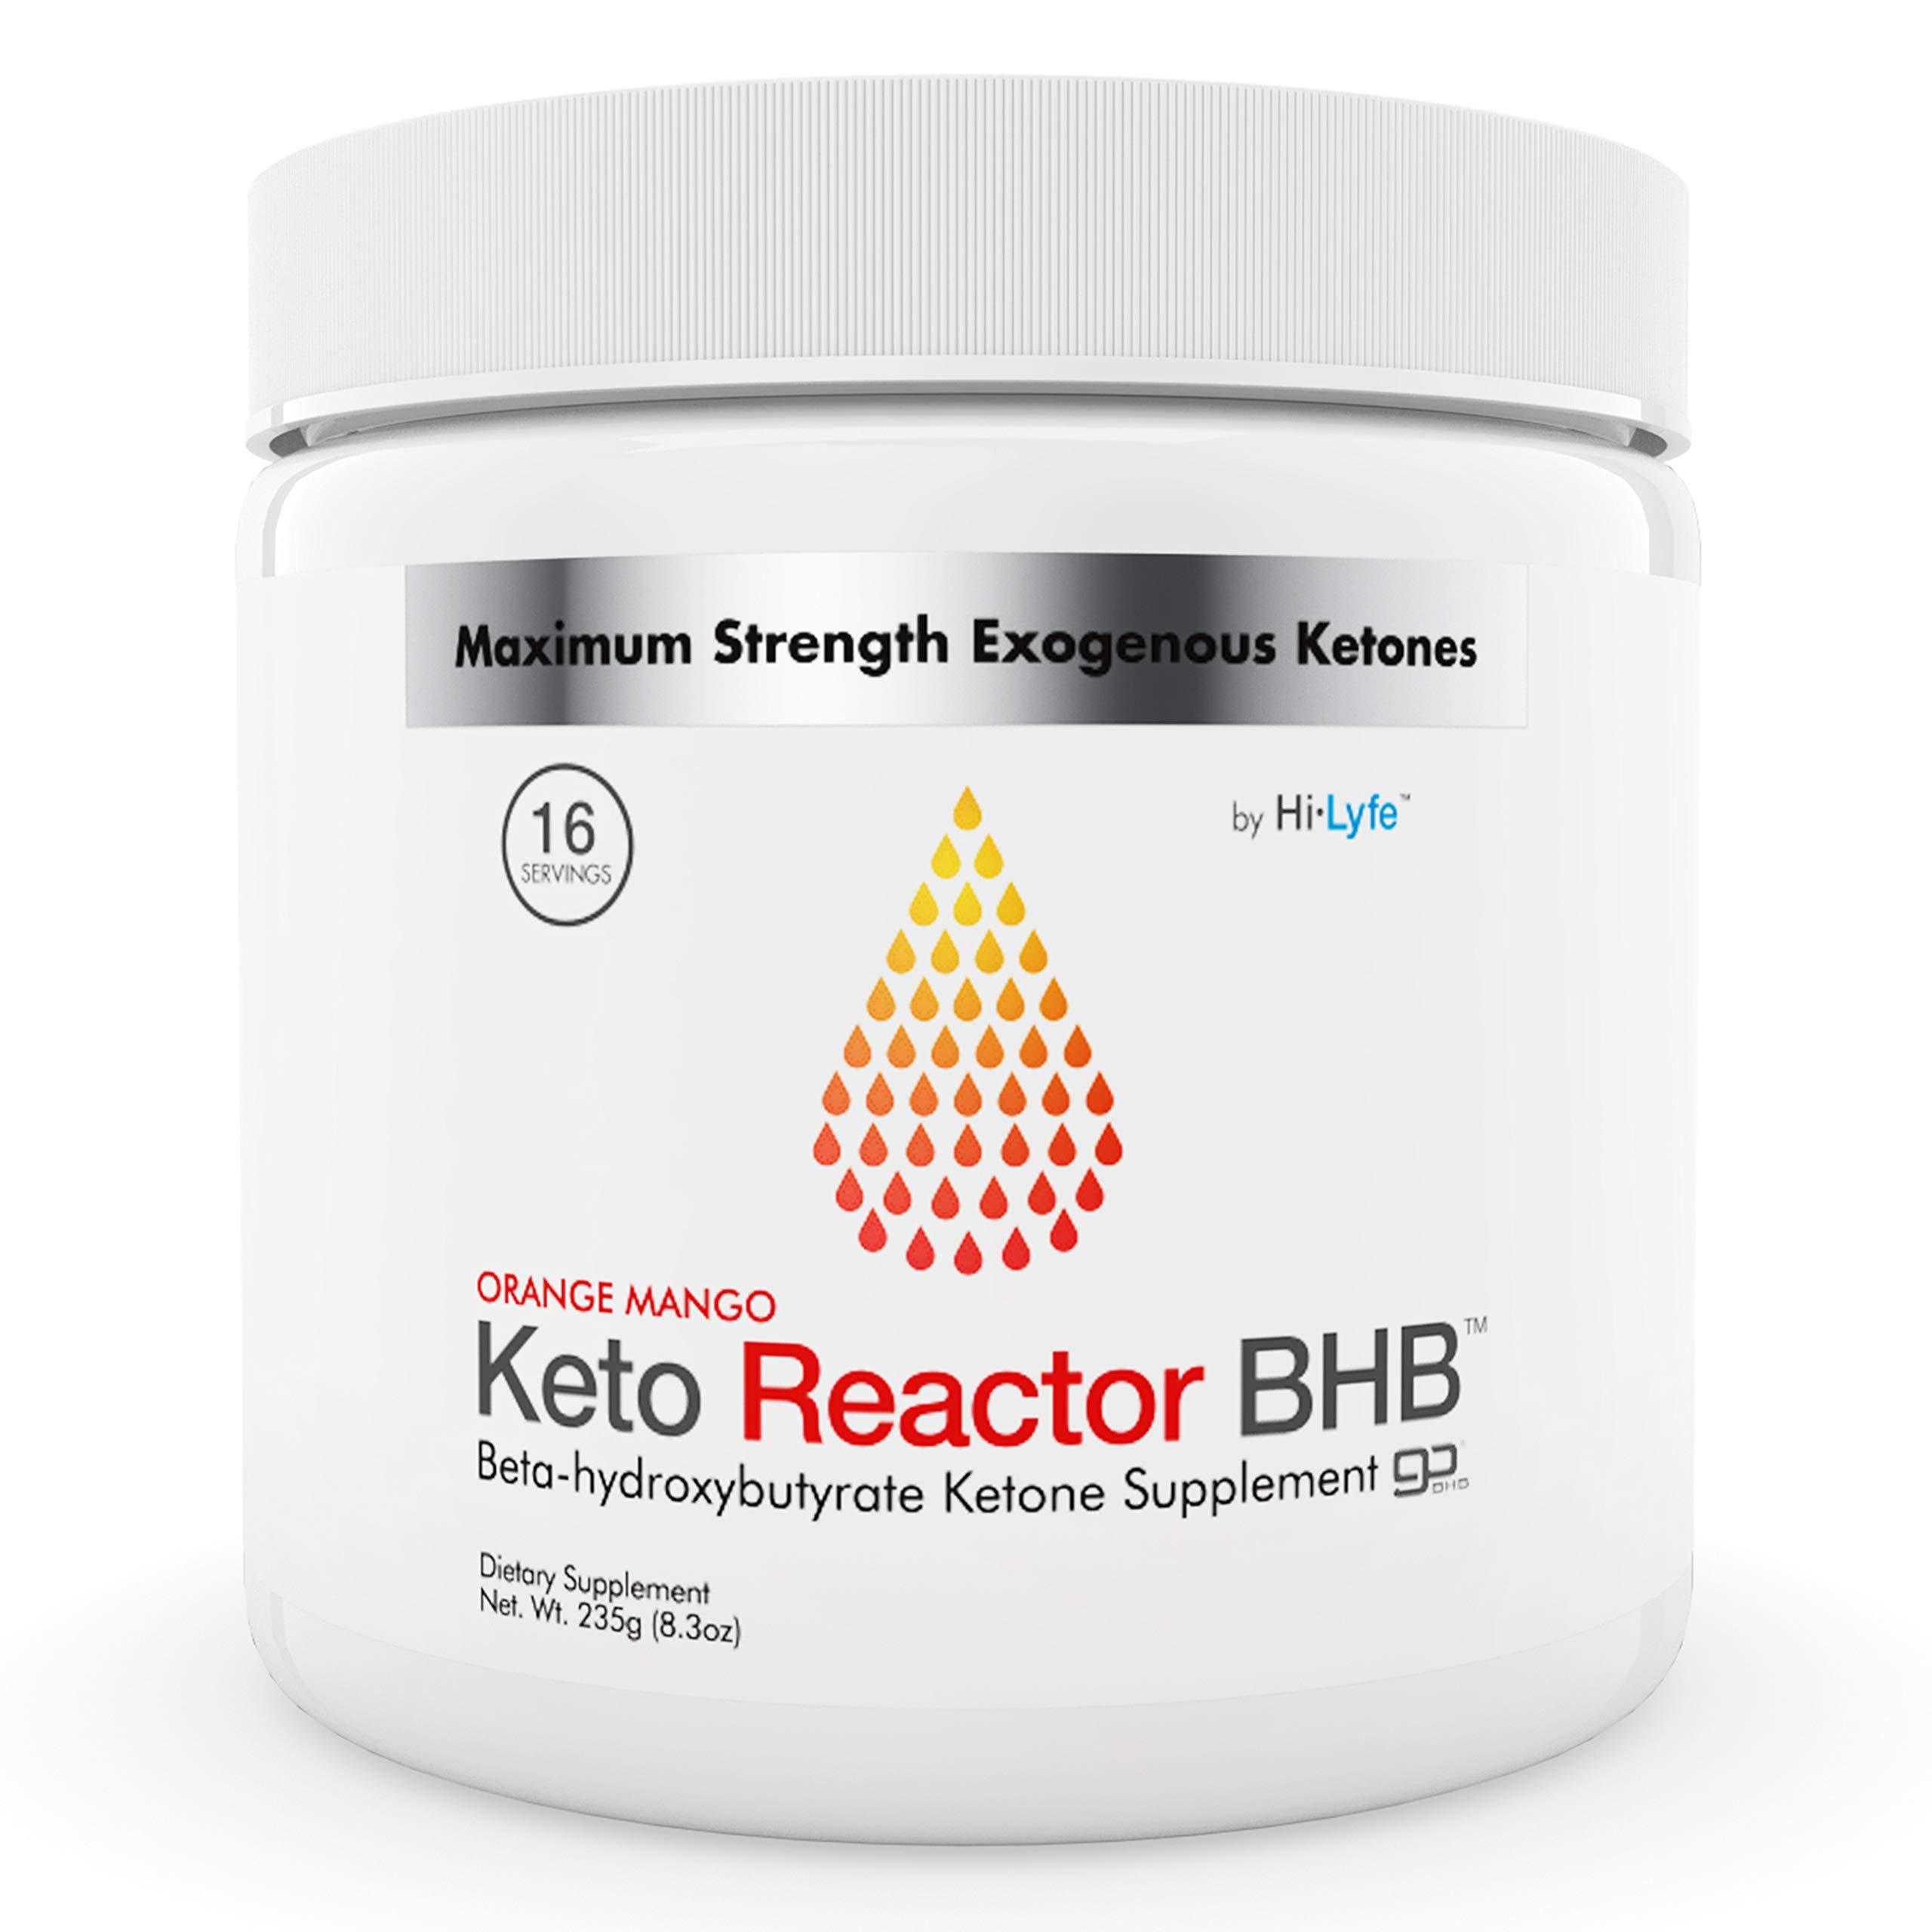 Keto Reactor Exogenous Ketone Powder | 11.4g Patented Go BHB Salts Supplement | 10X Shark Tank Keto Diet Pills Formula | Instant Ketosis, Energy & Focus | No Maltodextrin | by Hi-Lyte | Orange Mango